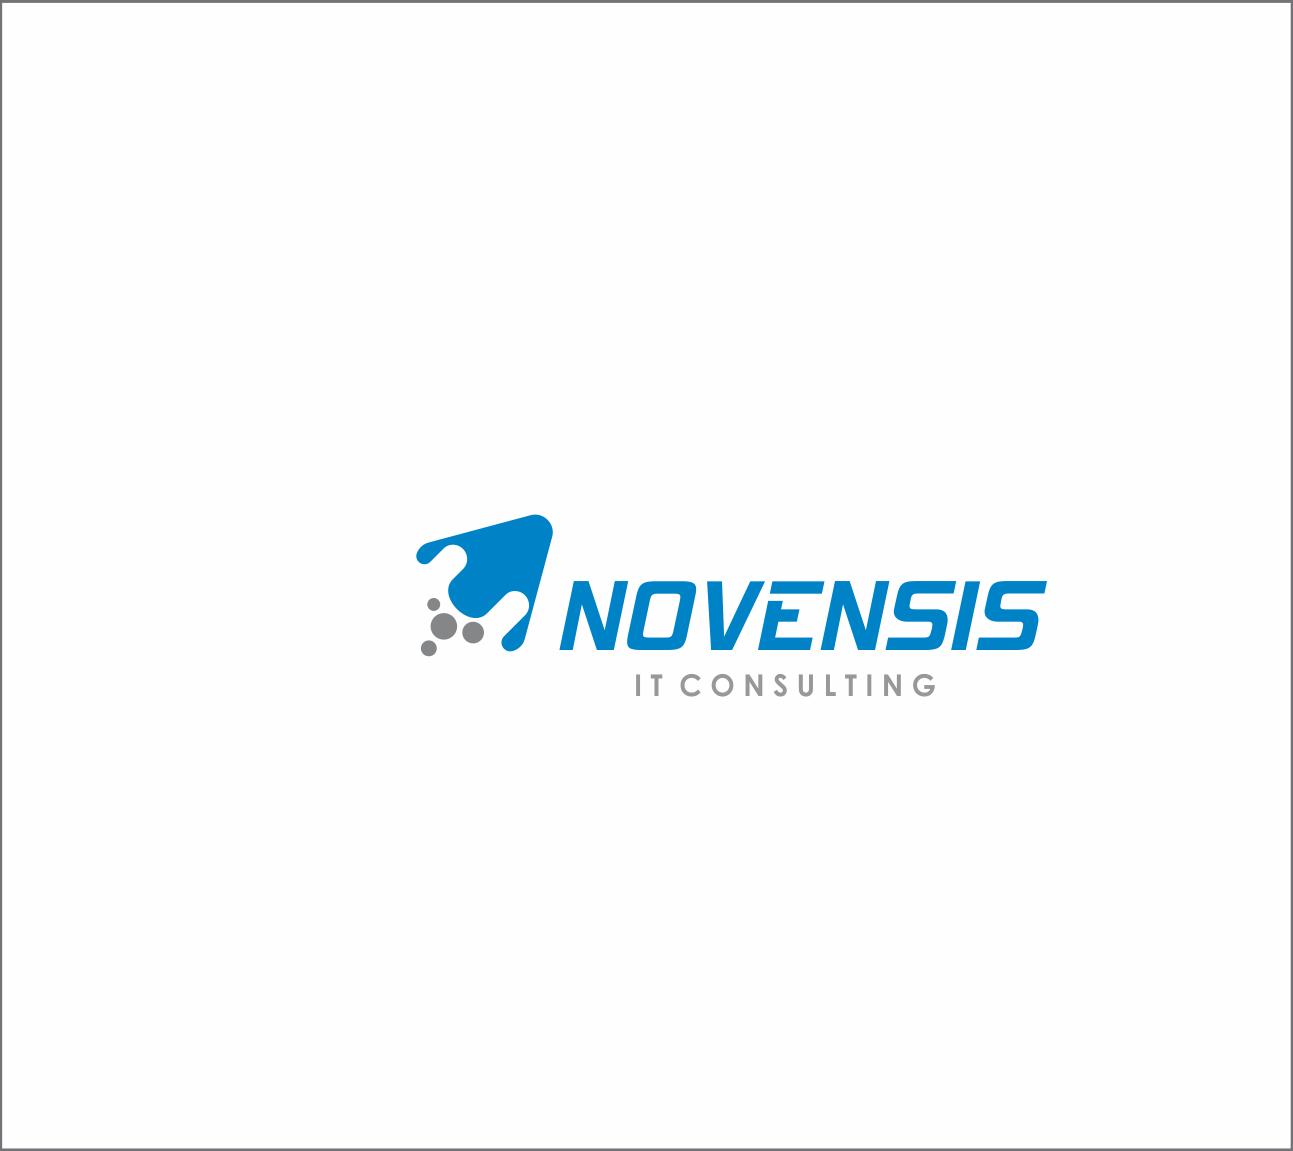 Logo Design by Armada Jamaluddin - Entry No. 118 in the Logo Design Contest Novensis Logo Design.